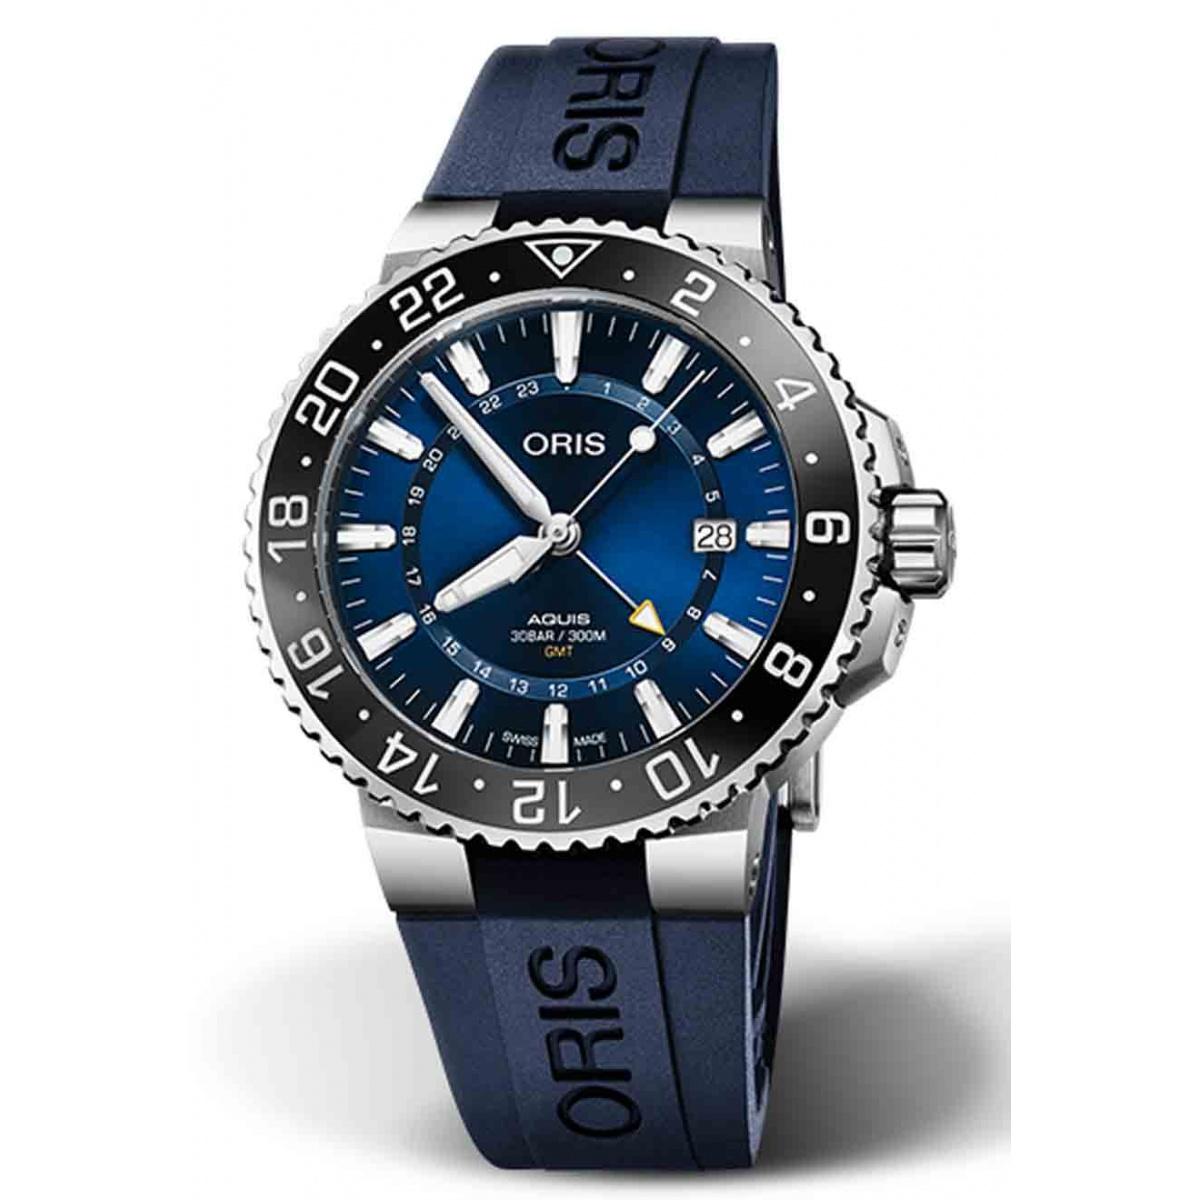 ORIS AQUIS GMT DATE 300 M ∅43,5 mm, Esfera azul, caucho azul